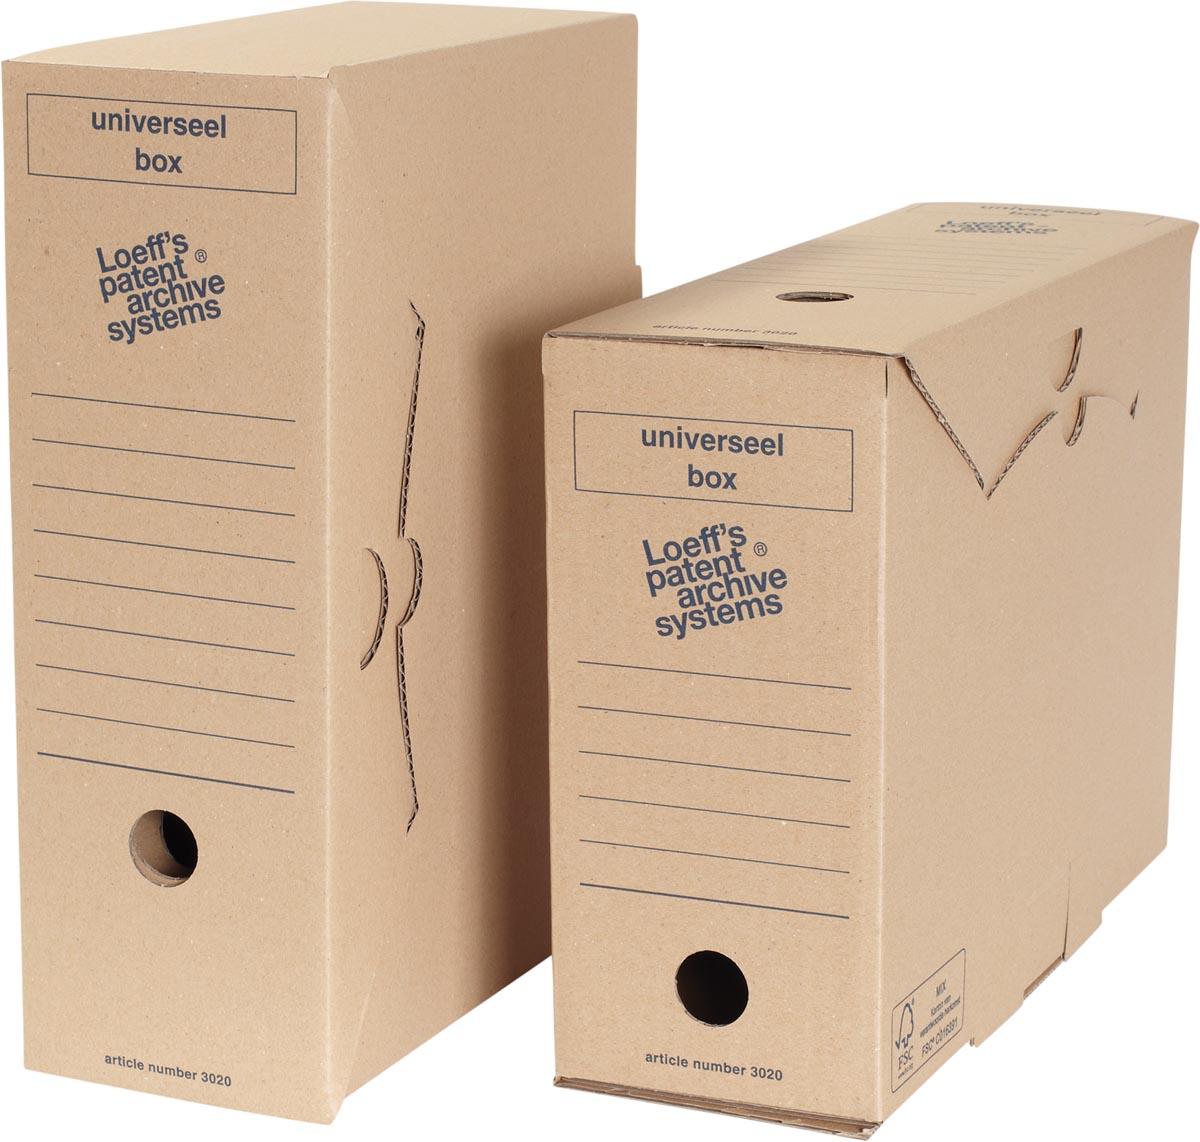 Loeff's archiefdoos Universeel box, golfkarton, bruin, pak van 8 stuks